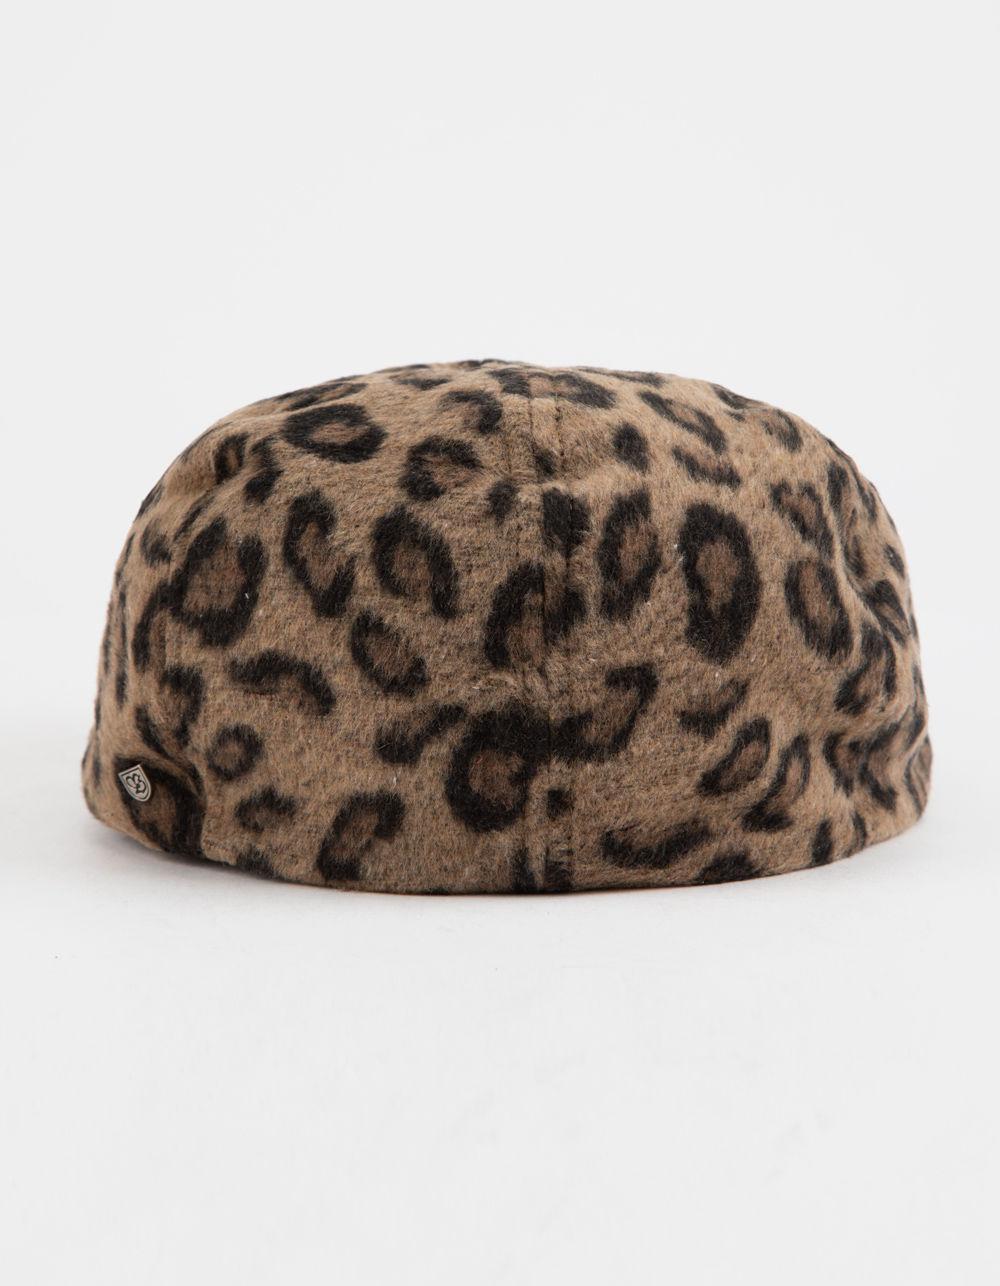 6824d00f8d9 Lyst - Brixton Brood Leopard Womens Snap Cap in Brown